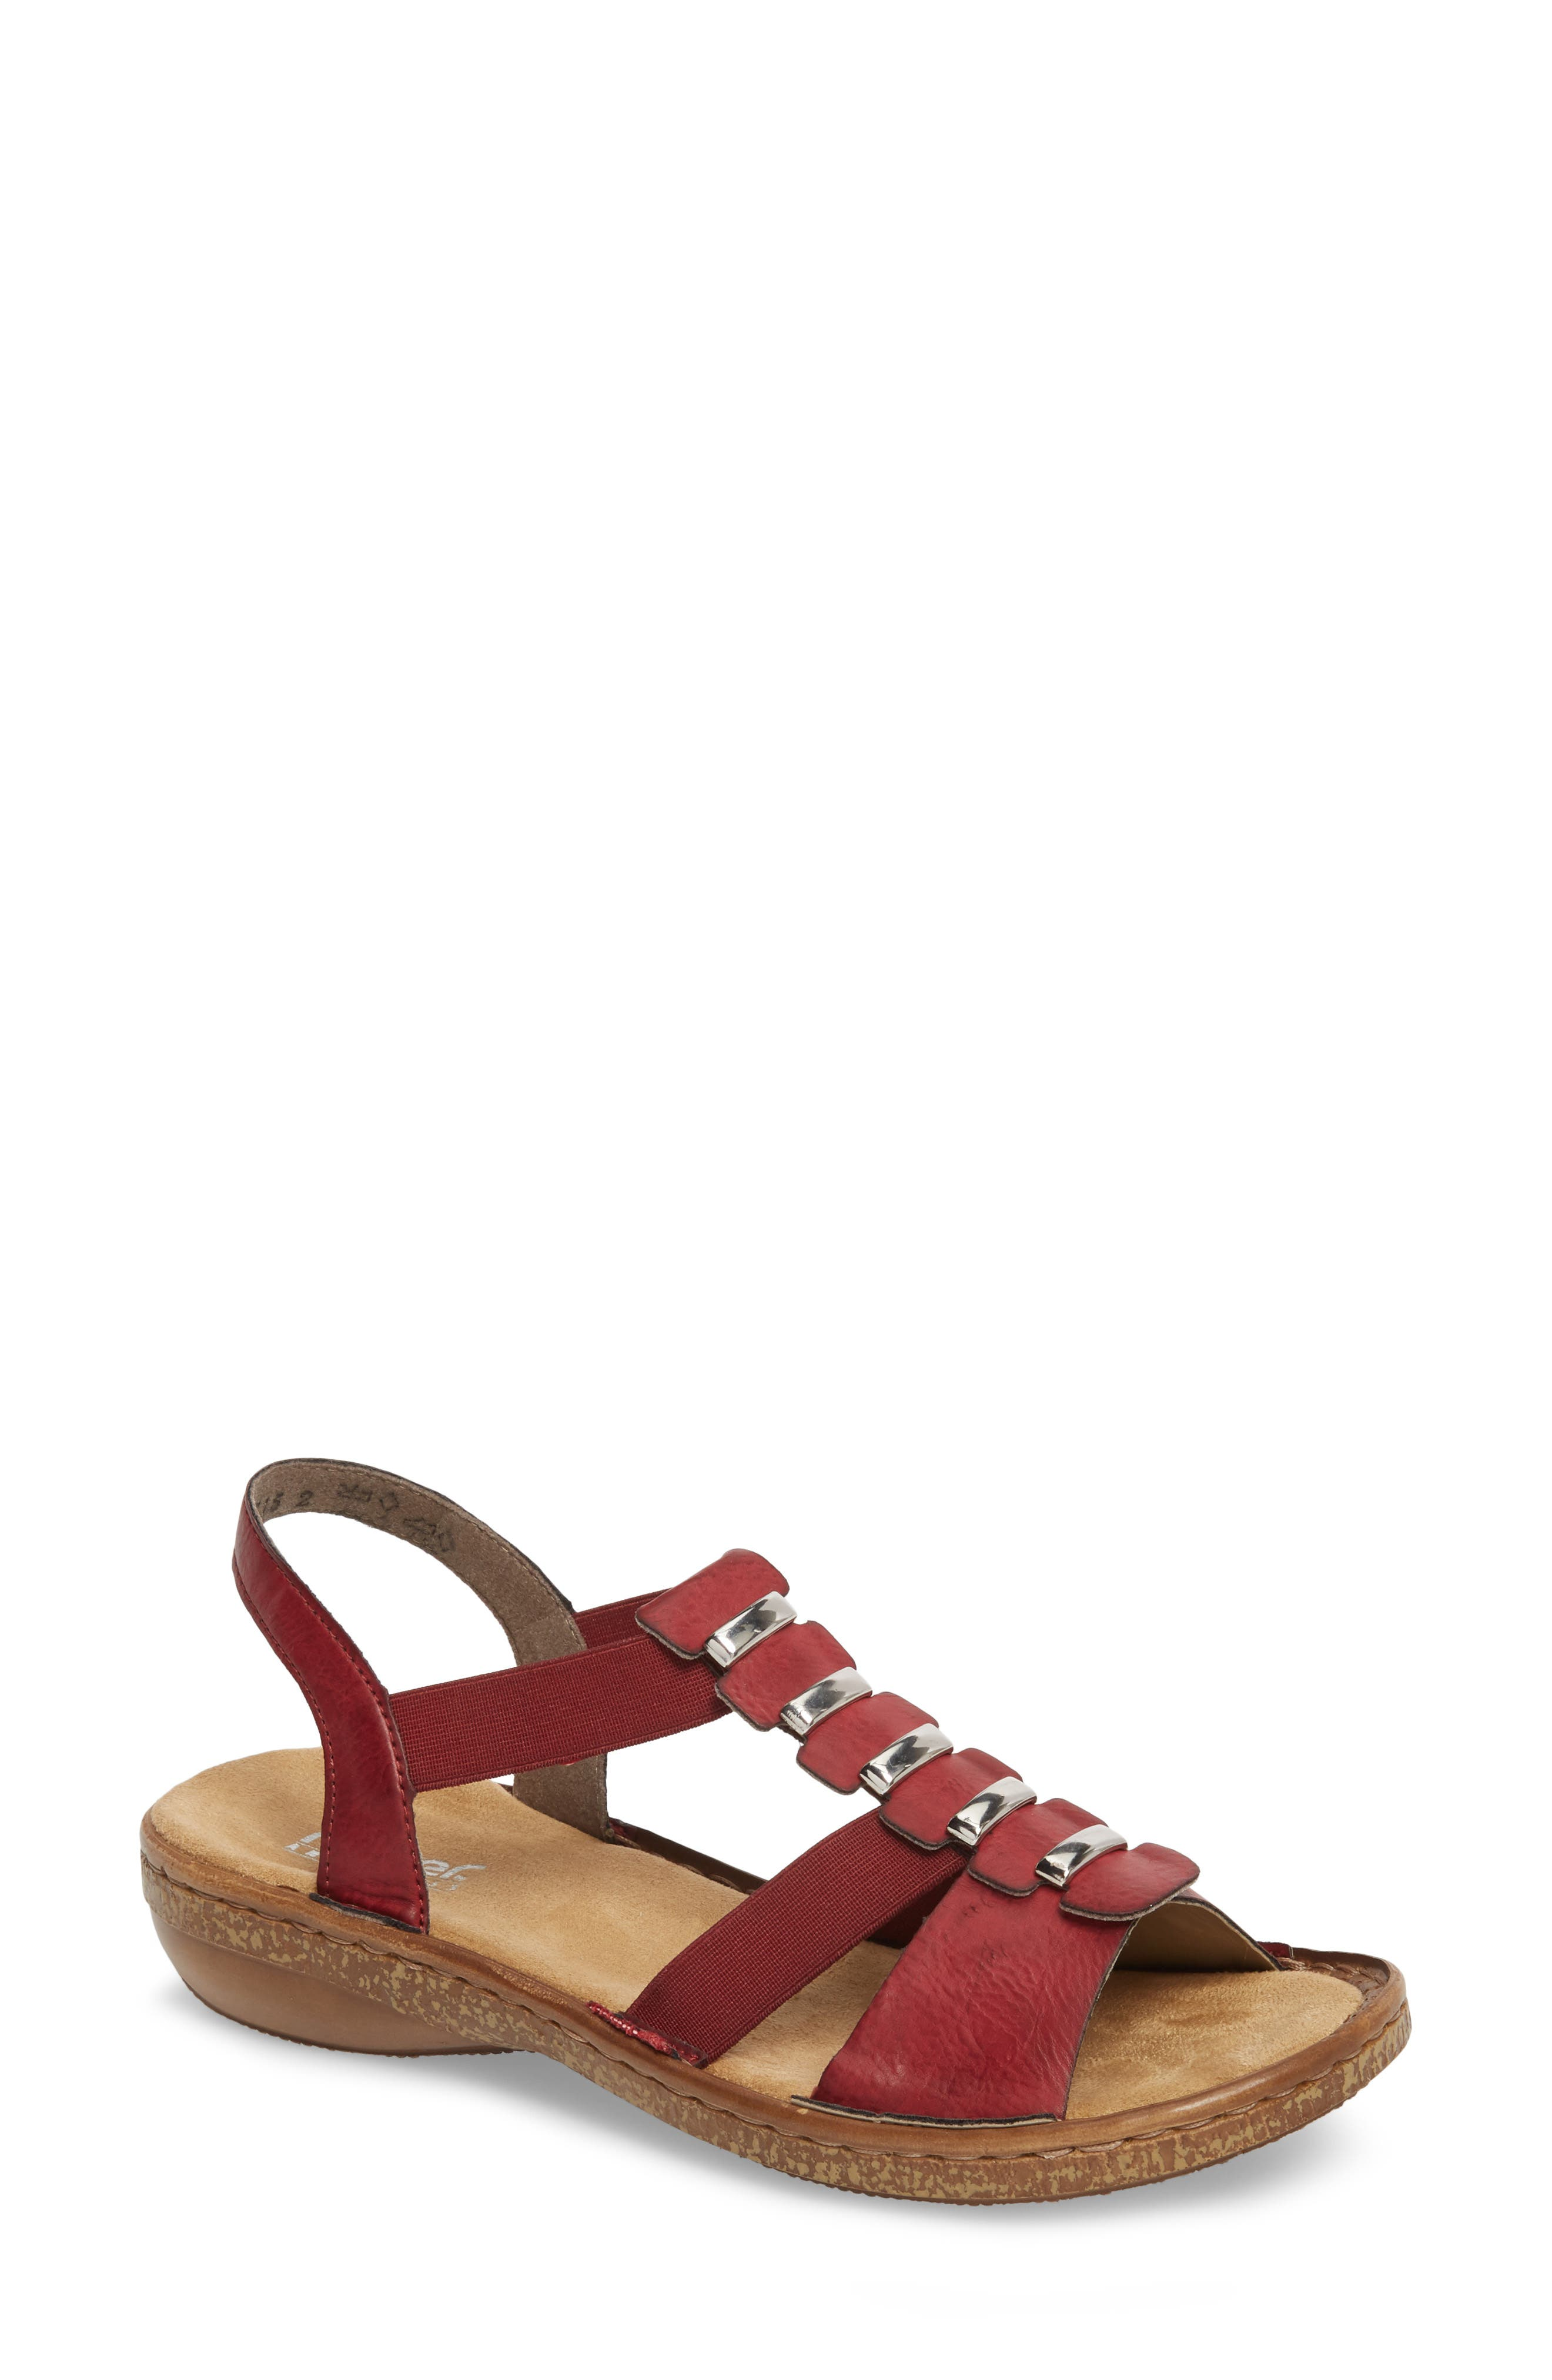 Regina 50 Sandal,                         Main,                         color, Wine